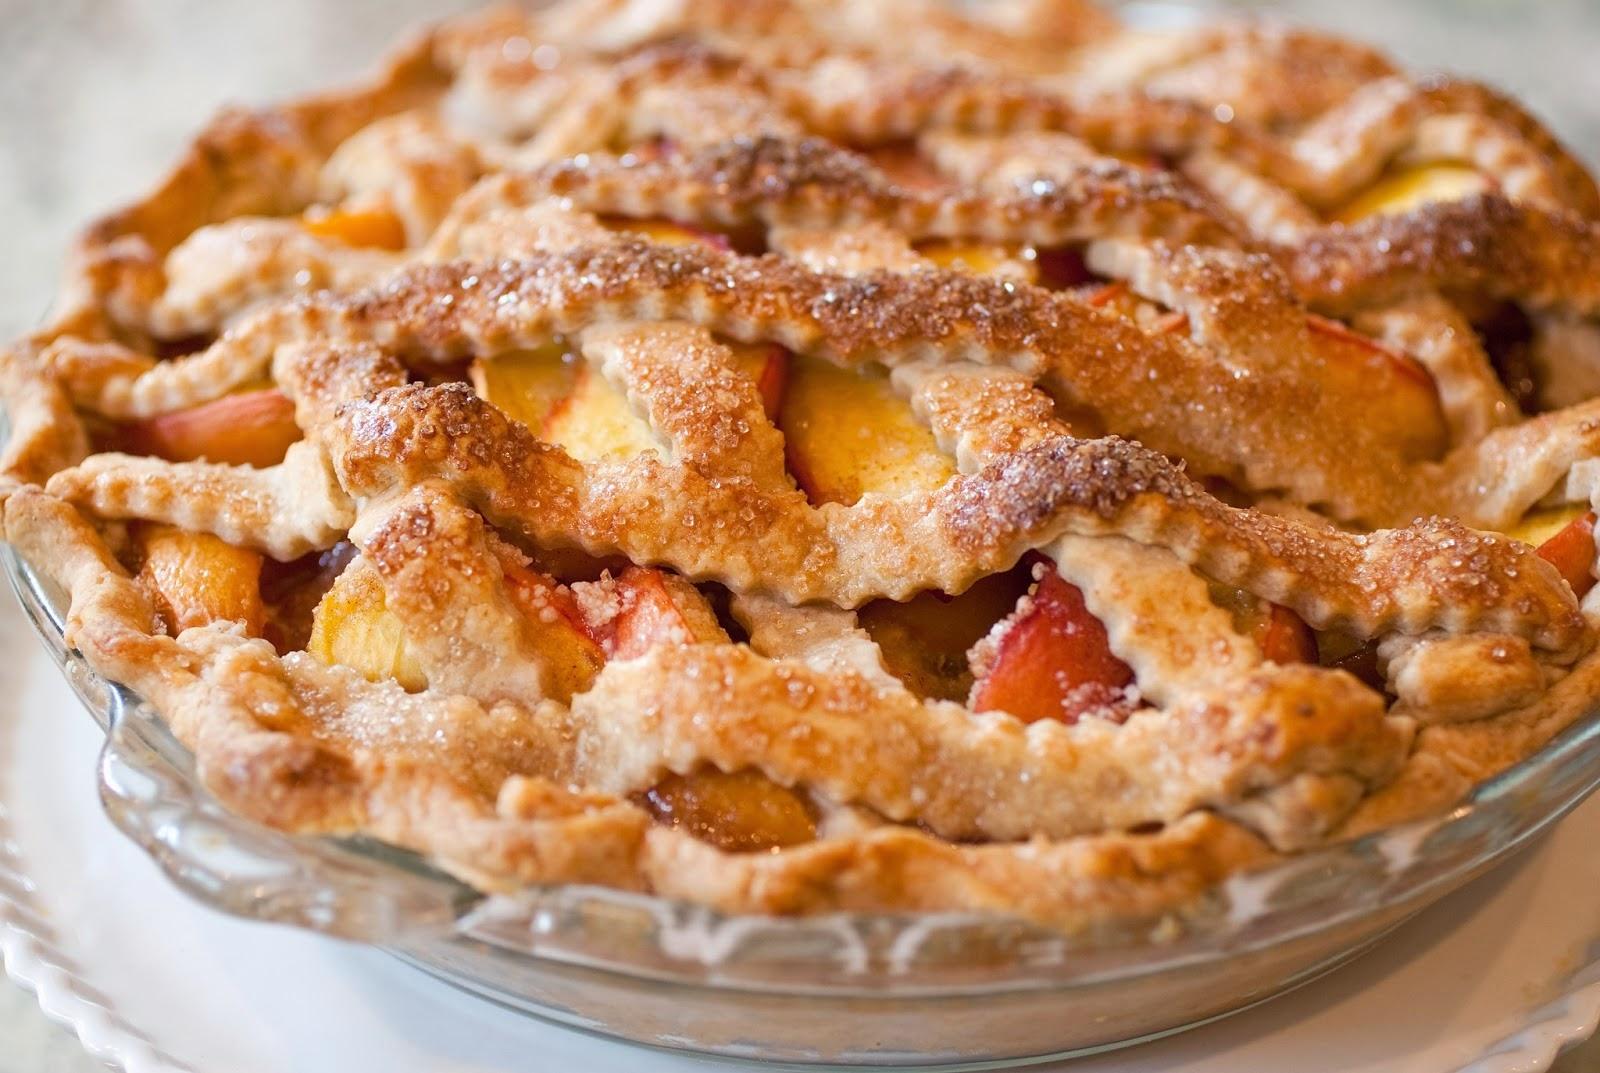 http://tishboyle.blogspot.com/2013/07/perfect-peach-pie.html